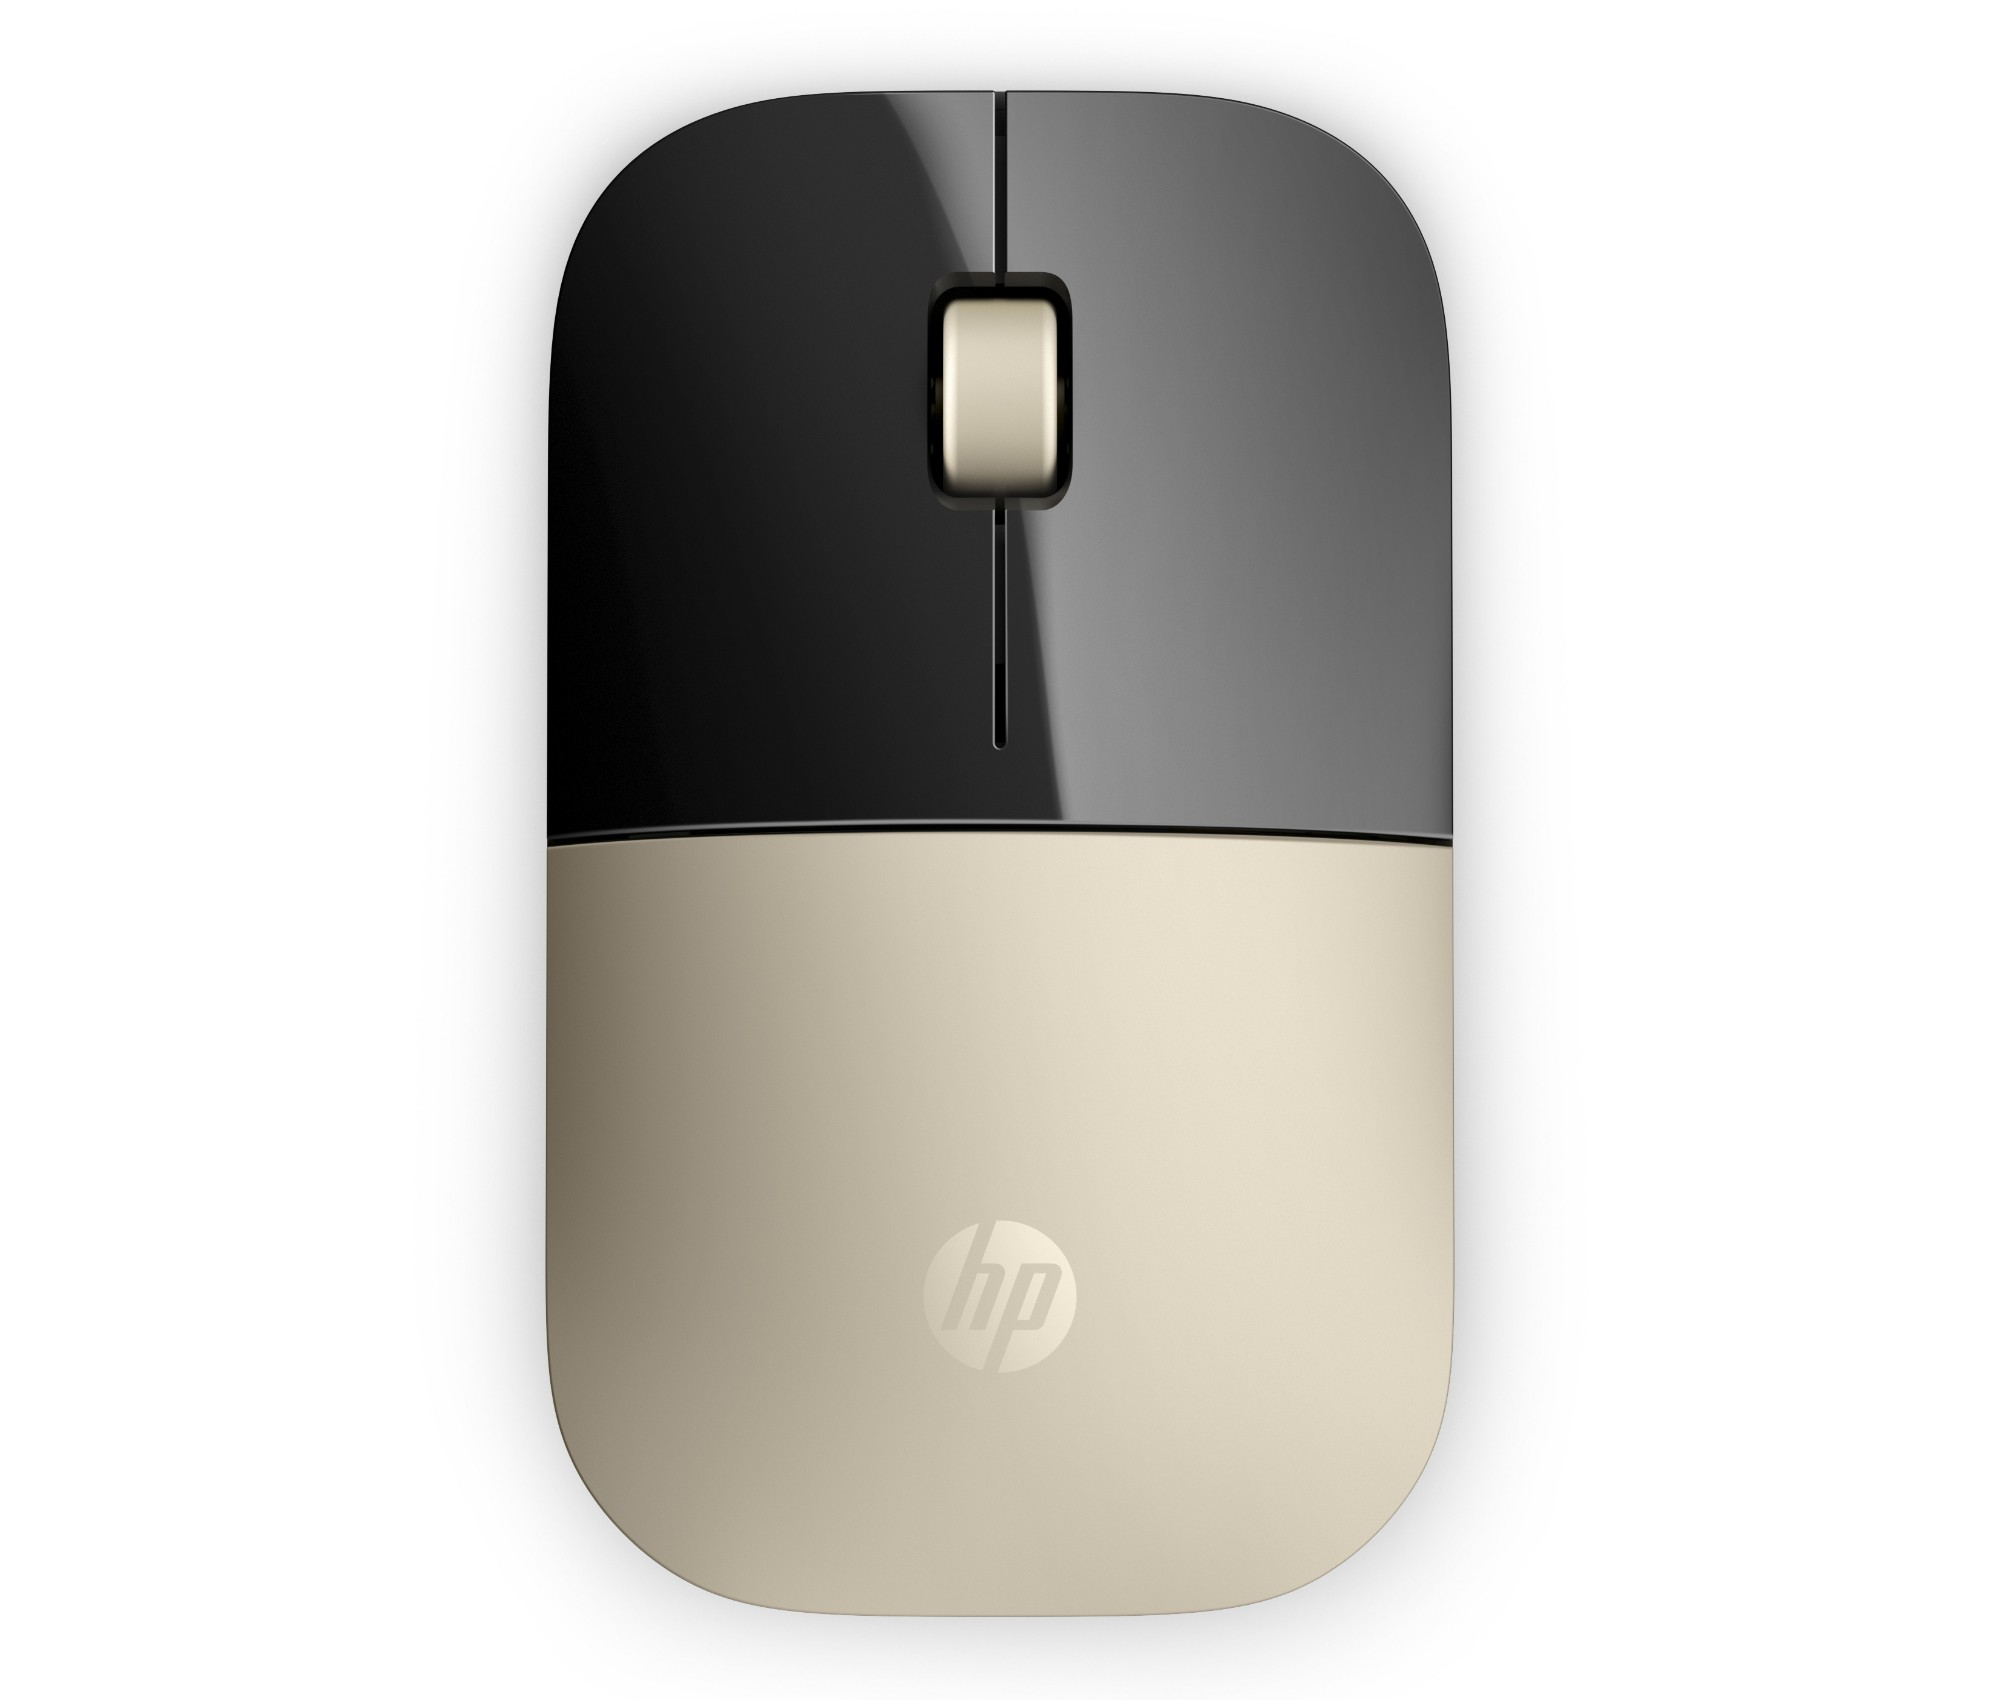 HP Z3700 mouse Ambidextrous RF Wireless Optical 1200 DPI